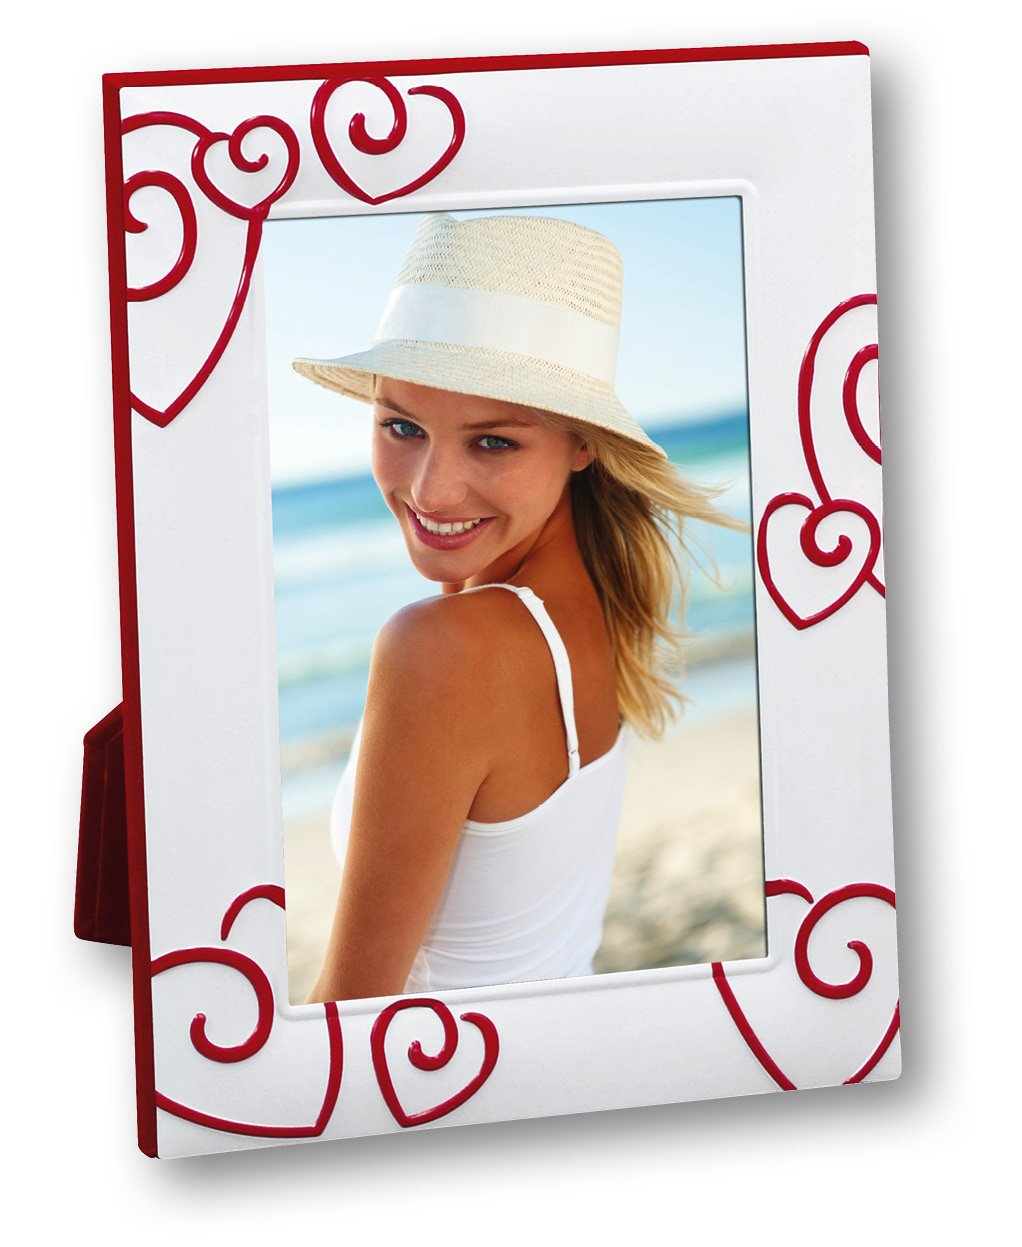 Amazon.de: Zep S.r.l RA57 Bilderrahmen Valentina Love, 13 x 18 cm